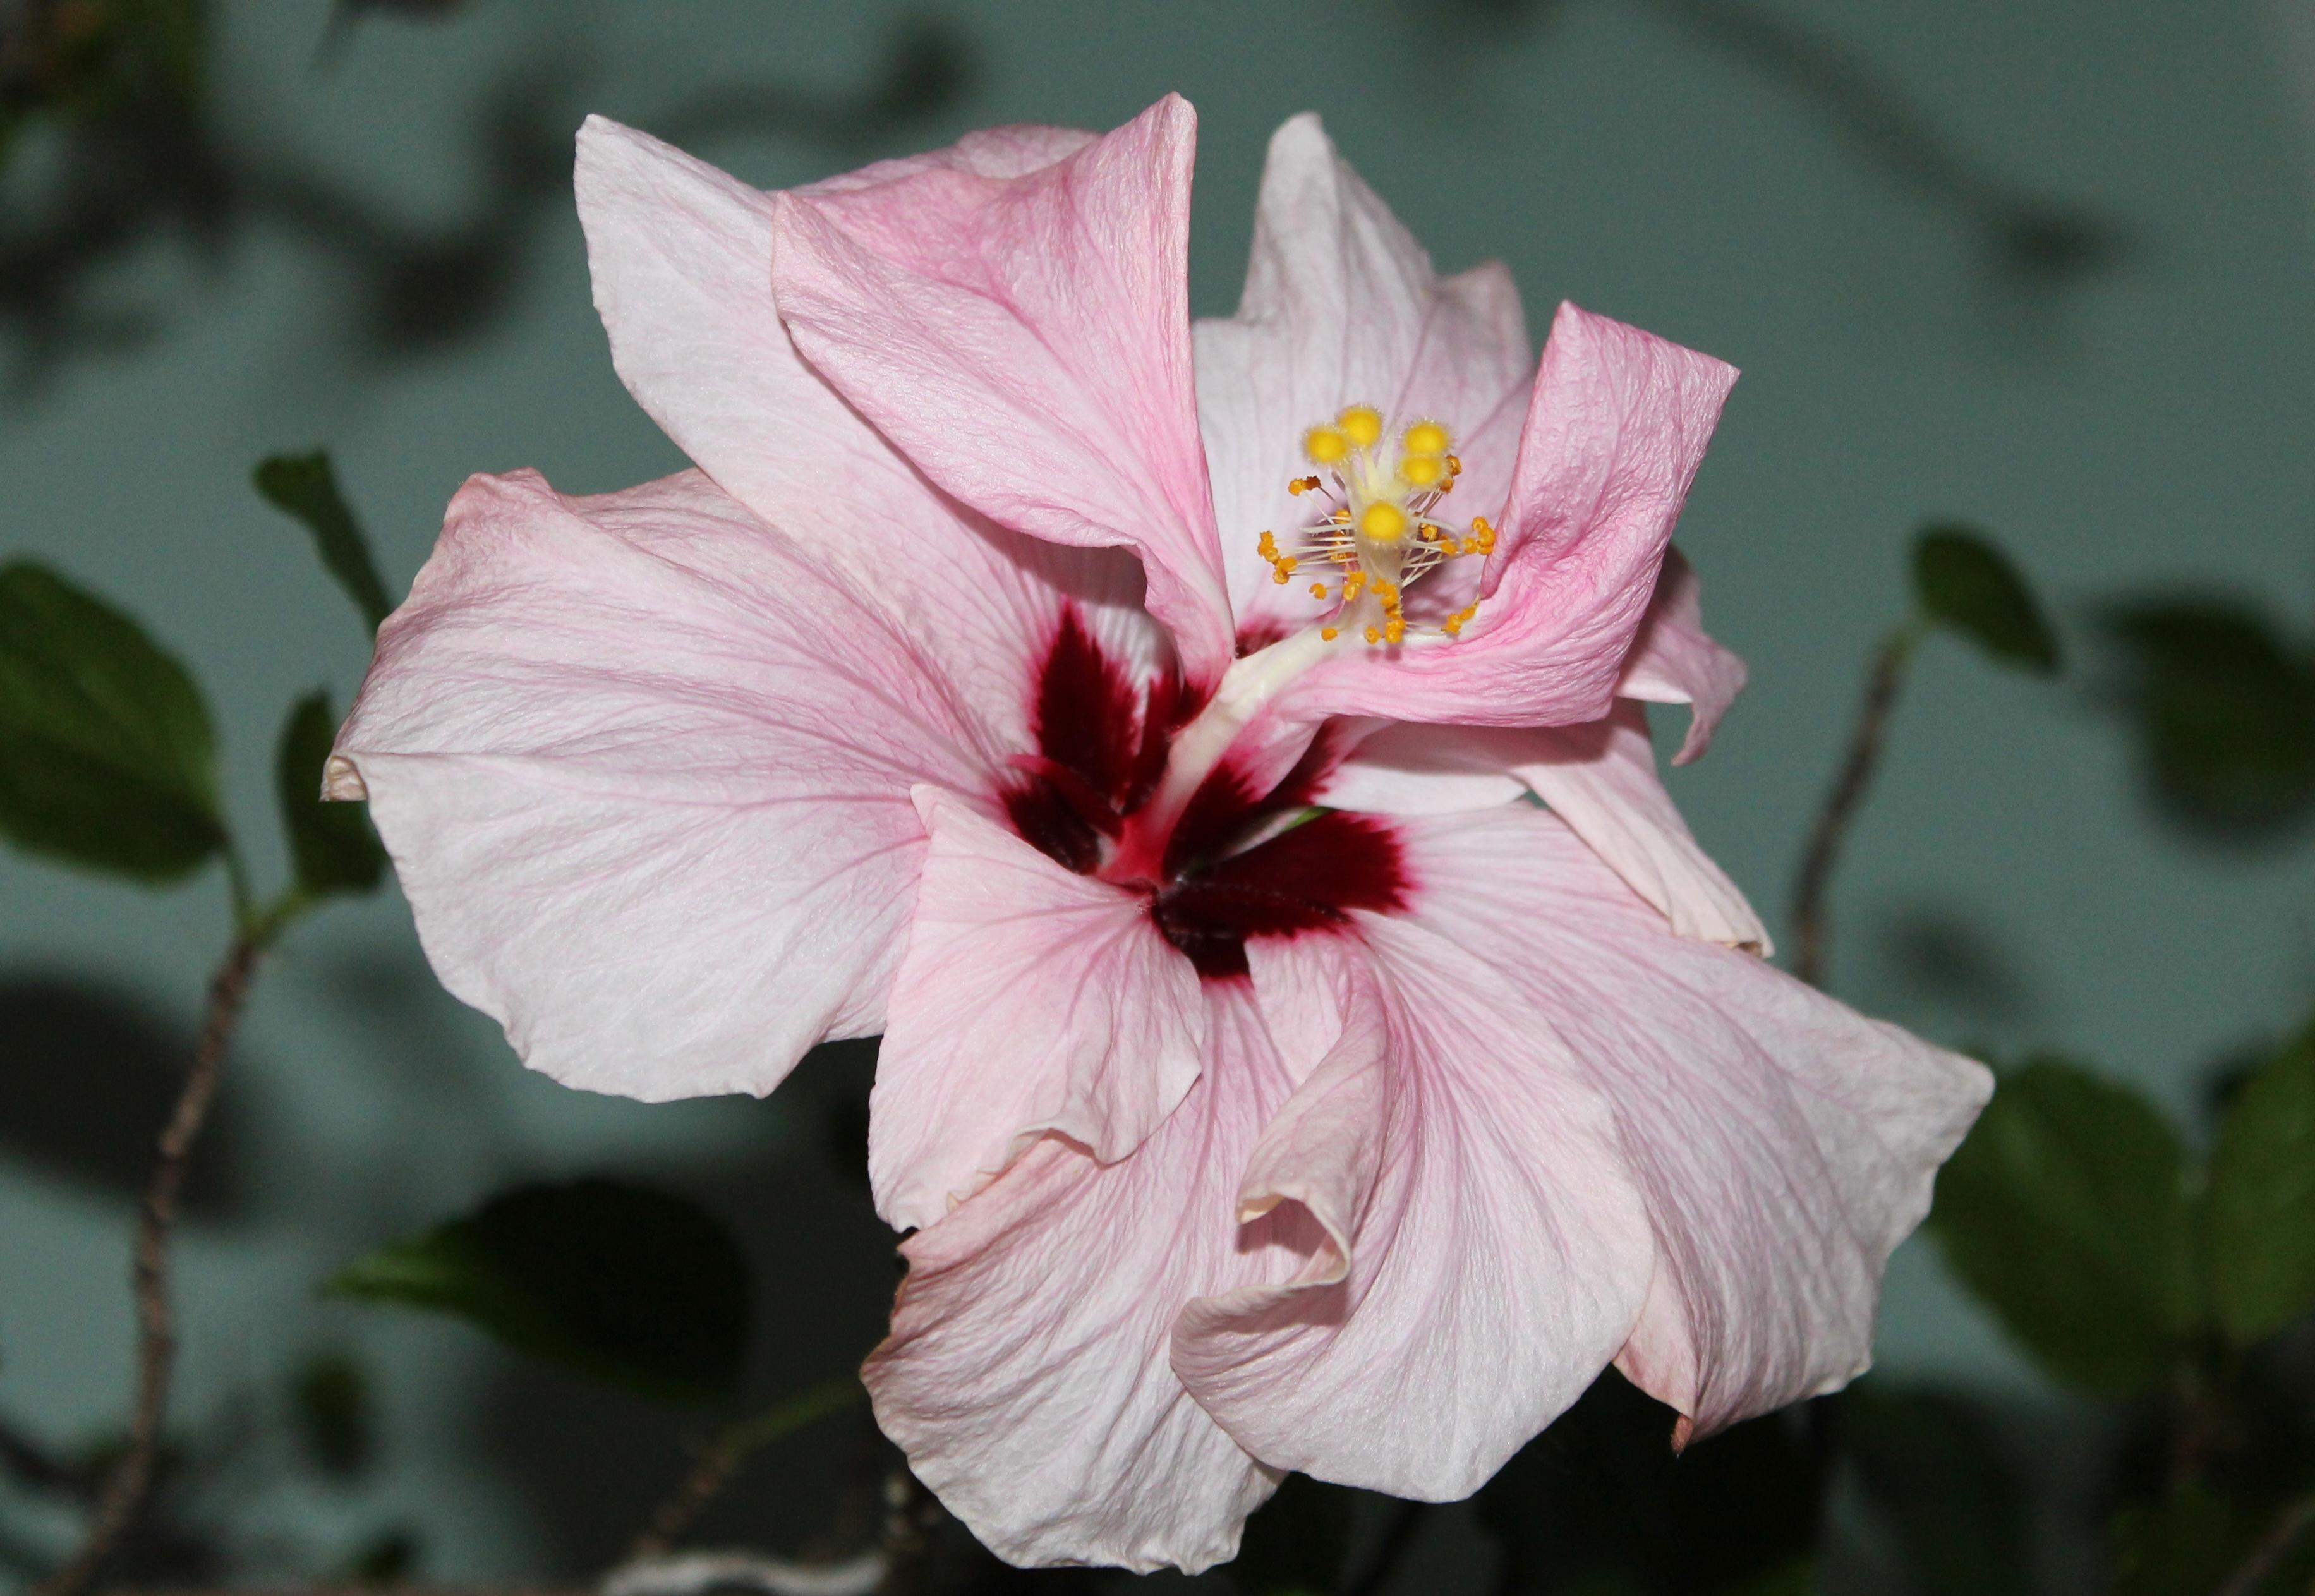 Wallpaper Nature Macro Petals Blossom Bokeh Pink Spring